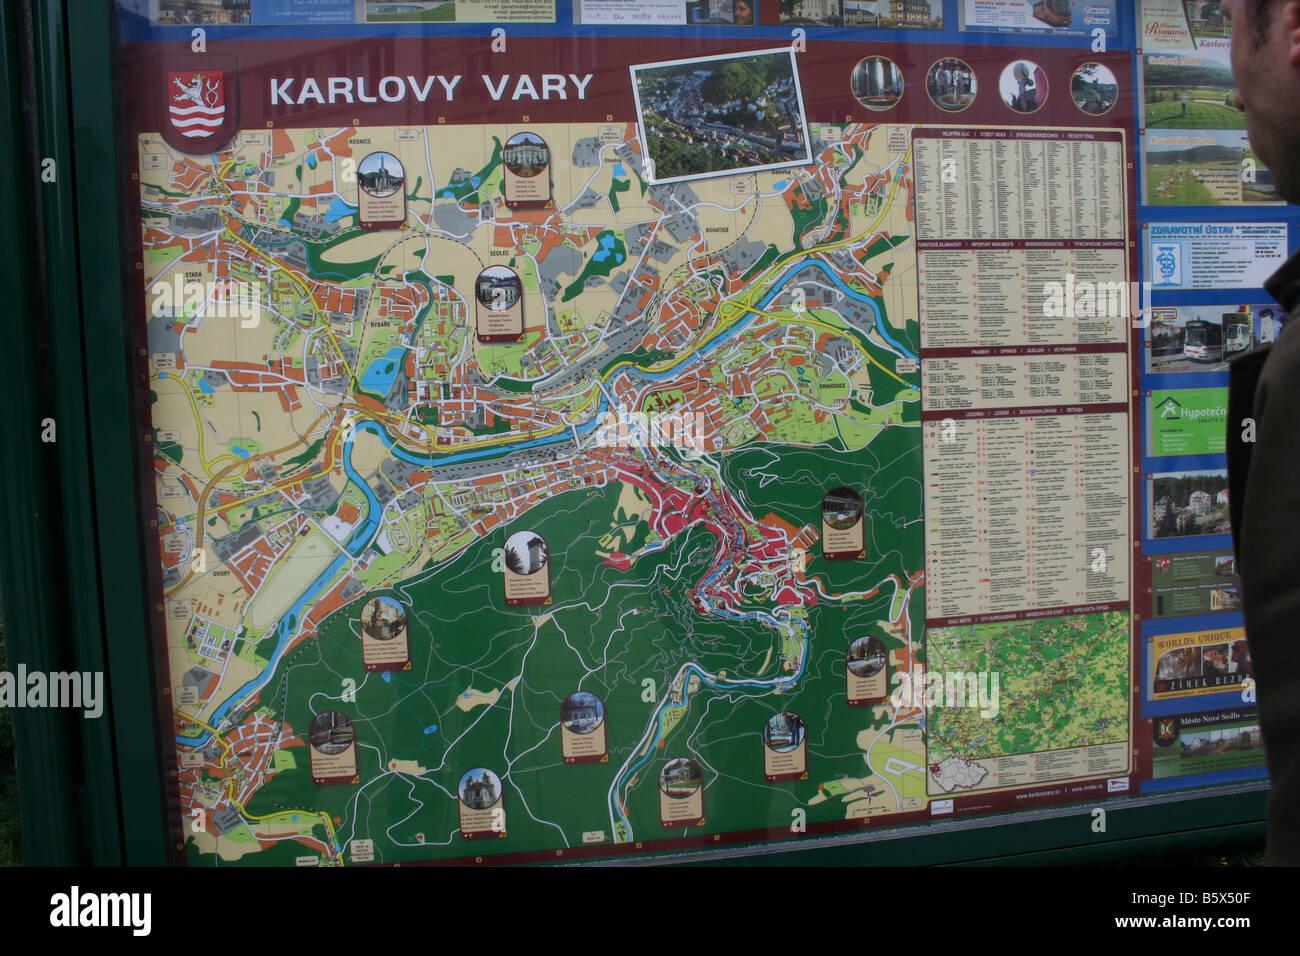 karlovy vary map tourist - photo #5